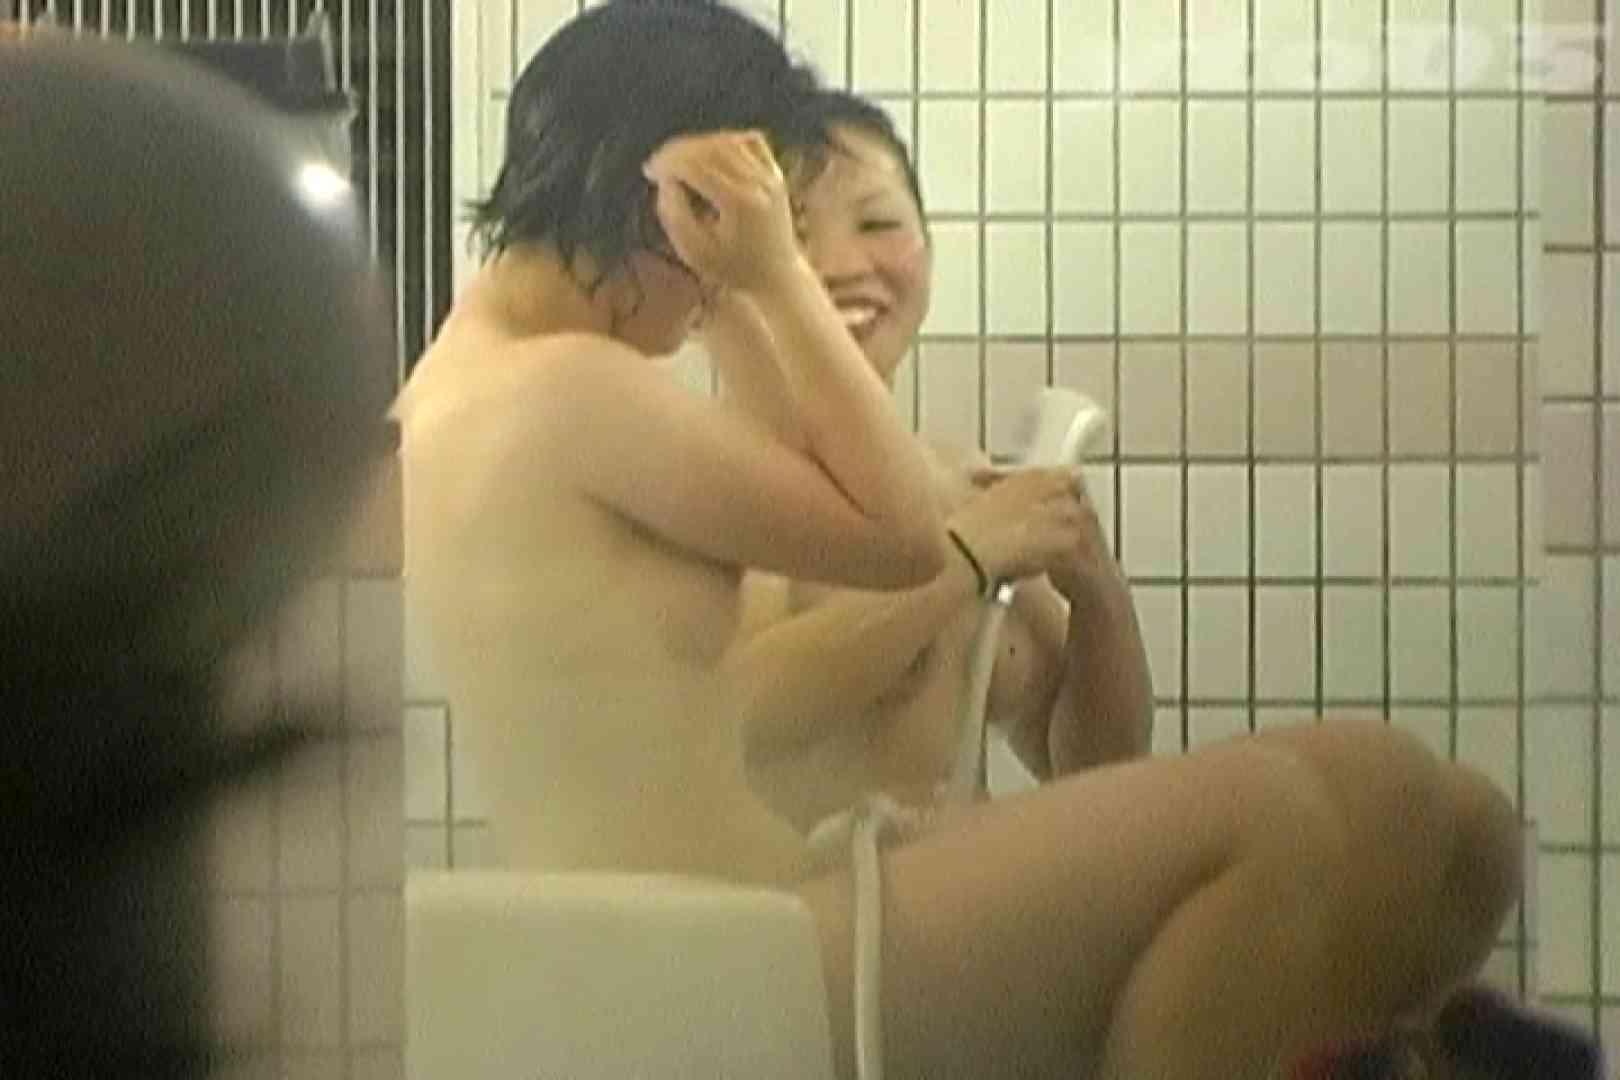 ▲復活限定▲合宿ホテル女風呂盗撮 Vol.28 盗撮編 オメコ無修正動画無料 93枚 20